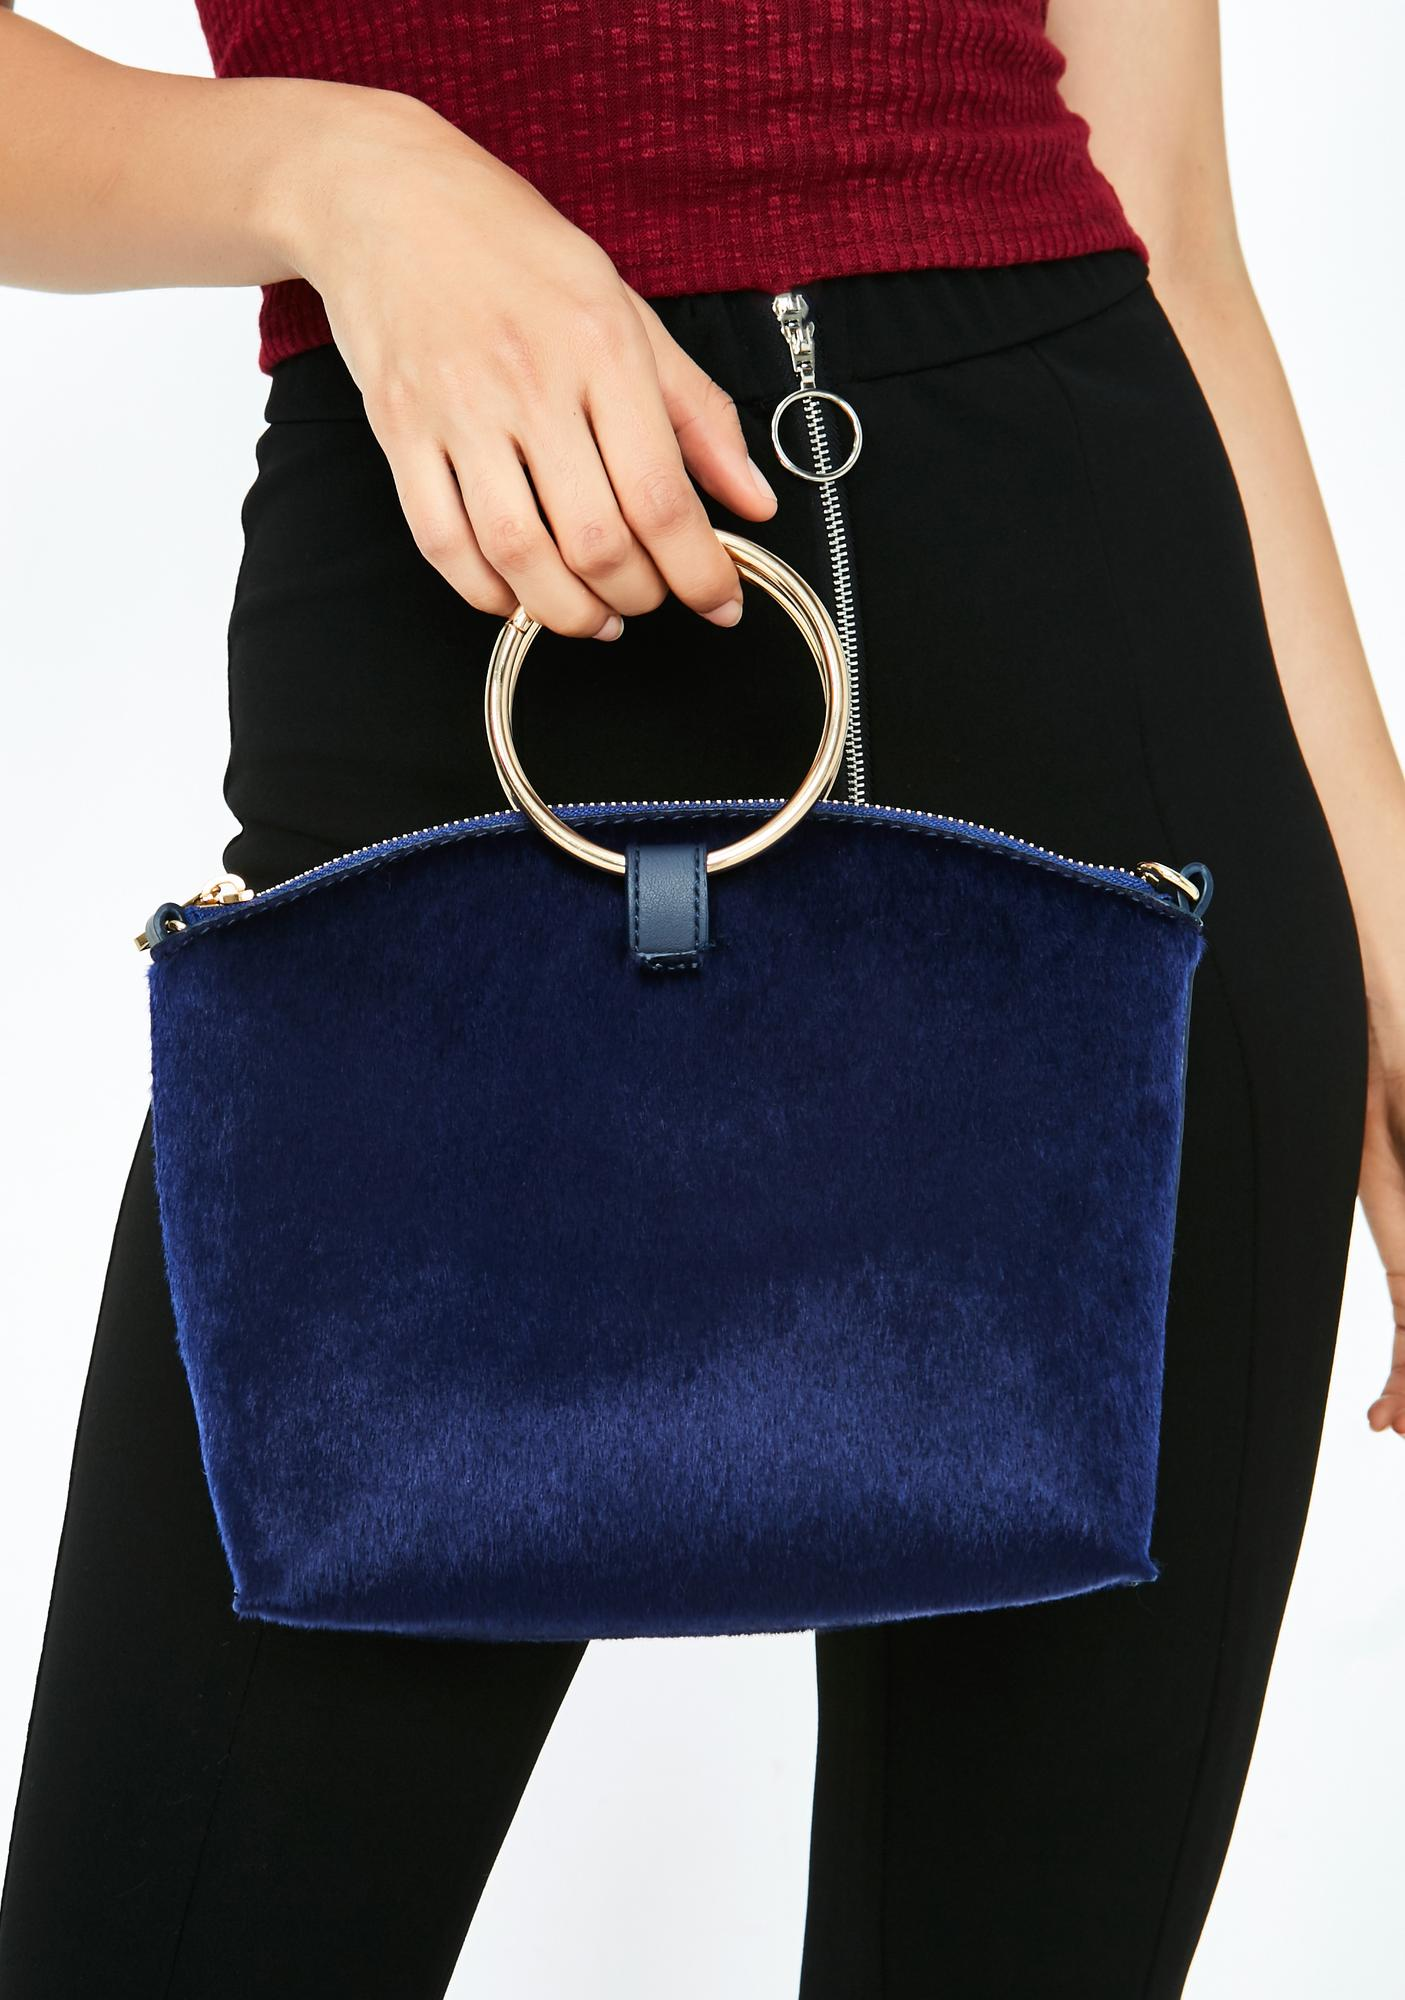 Oh Goodness O-Ring Bag